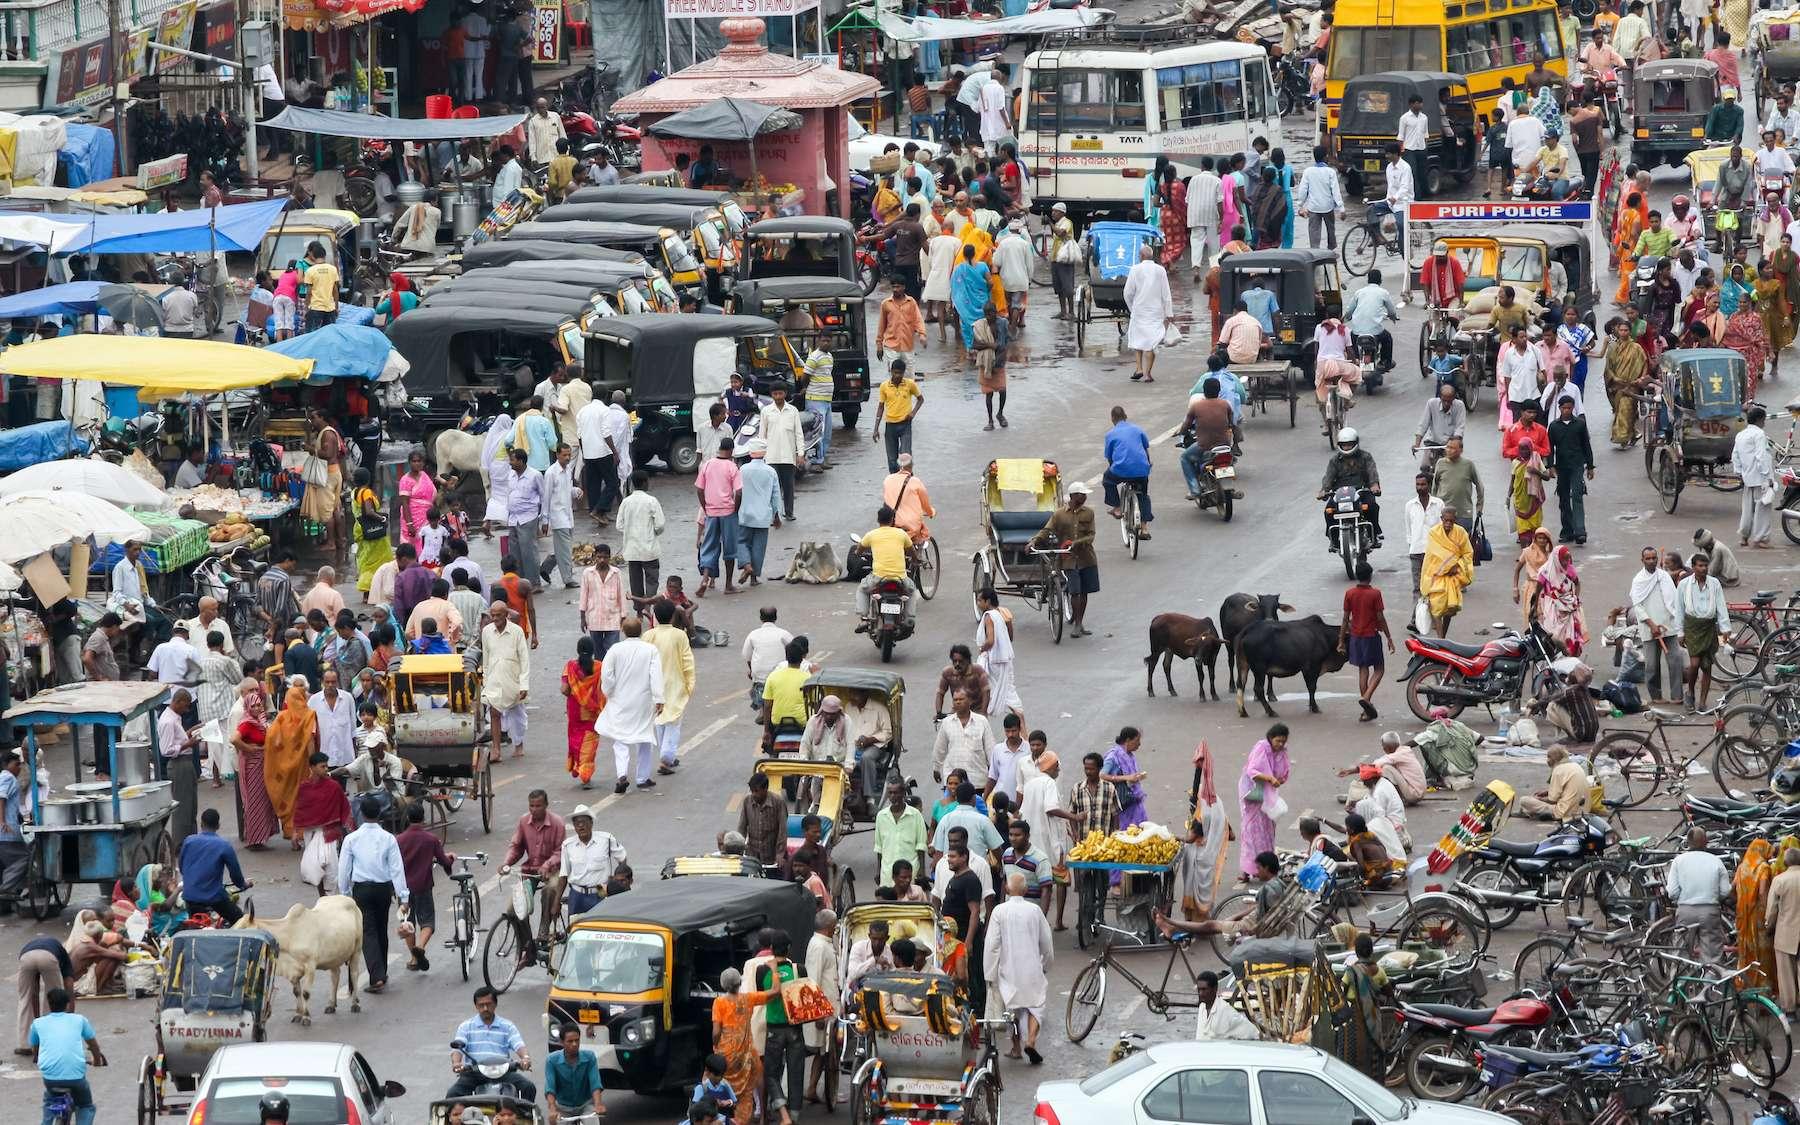 Épidémie de coronavirus : l'Inde, une exception mondiale ? © nilanewsom, Adobe Stock